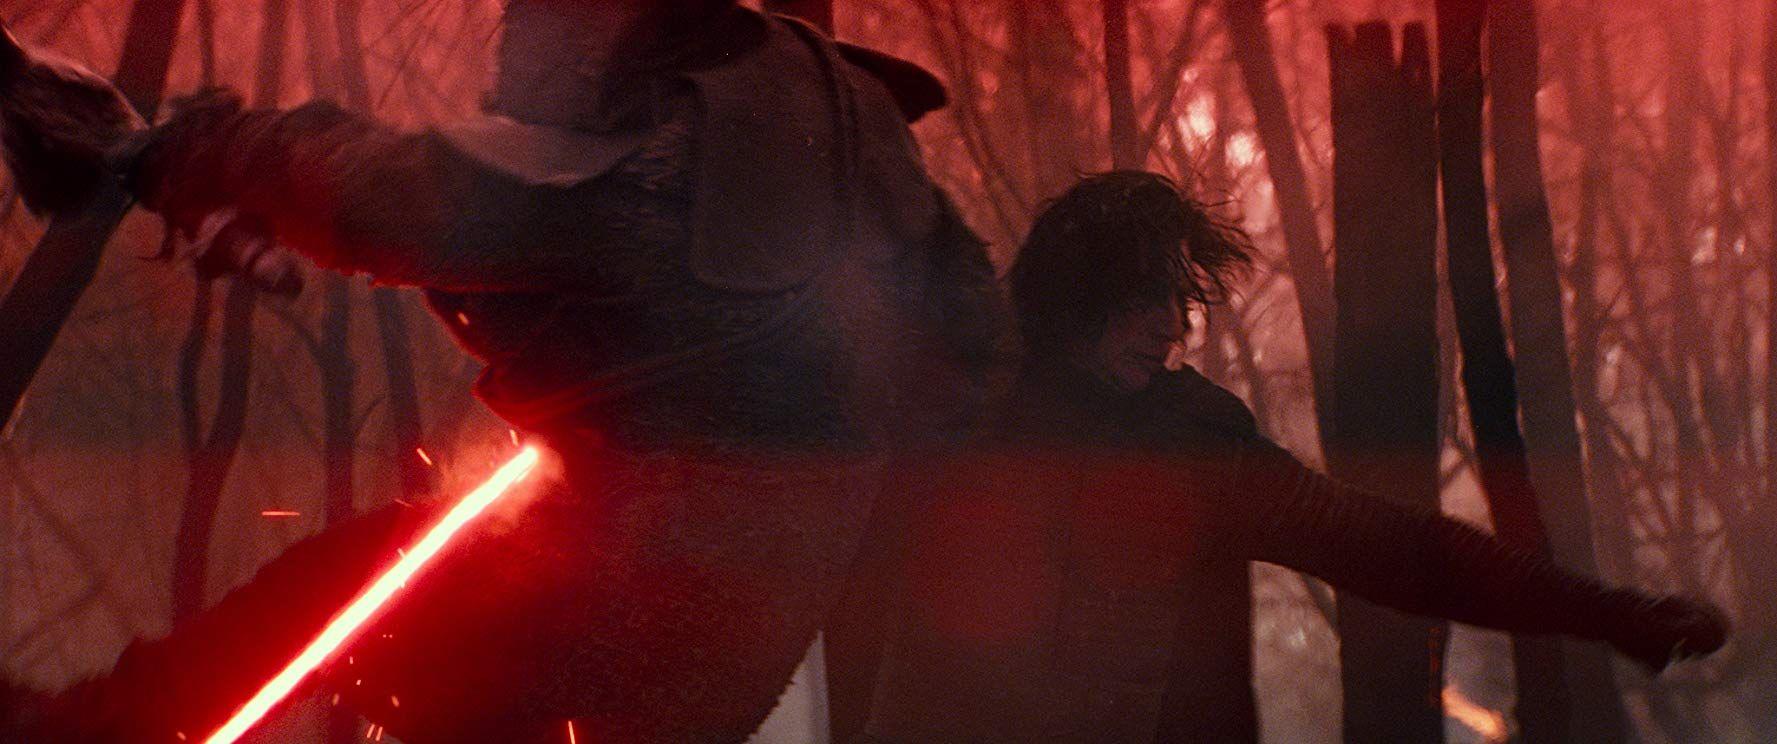 Imagen 6 de Star Wars: El Ascenso de Skywalker